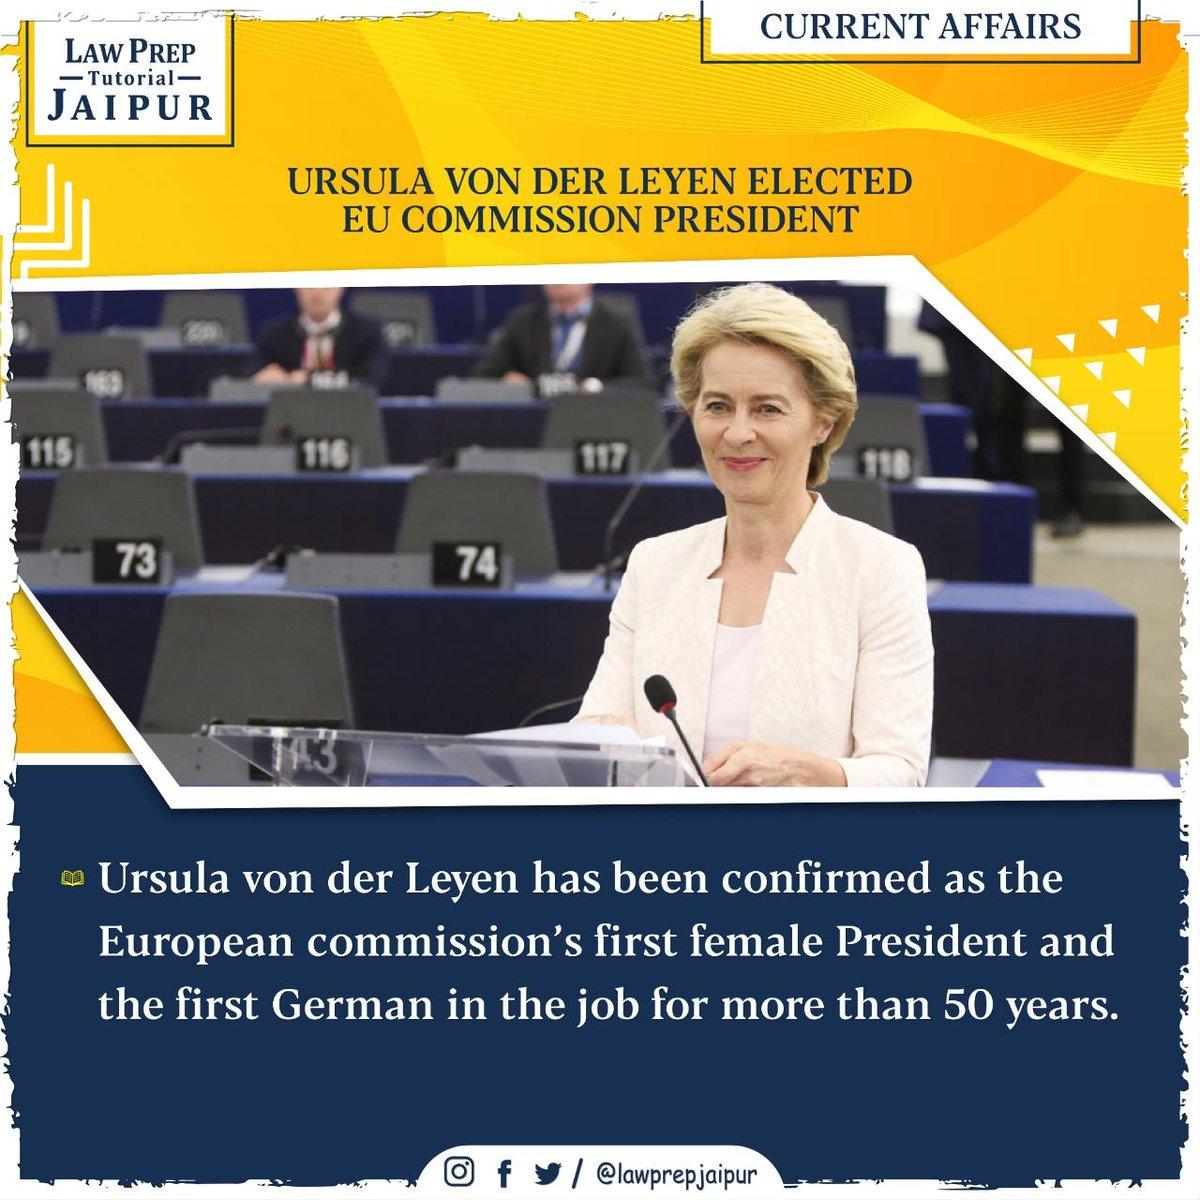 Stay connected for more such Current Affairs.  #Gk #CLATGK #CLAT2020 #CLATQuestions #currentaffairs #LegalGk #UrsulaVonDerLeyen #EuropeanCommissionPresident